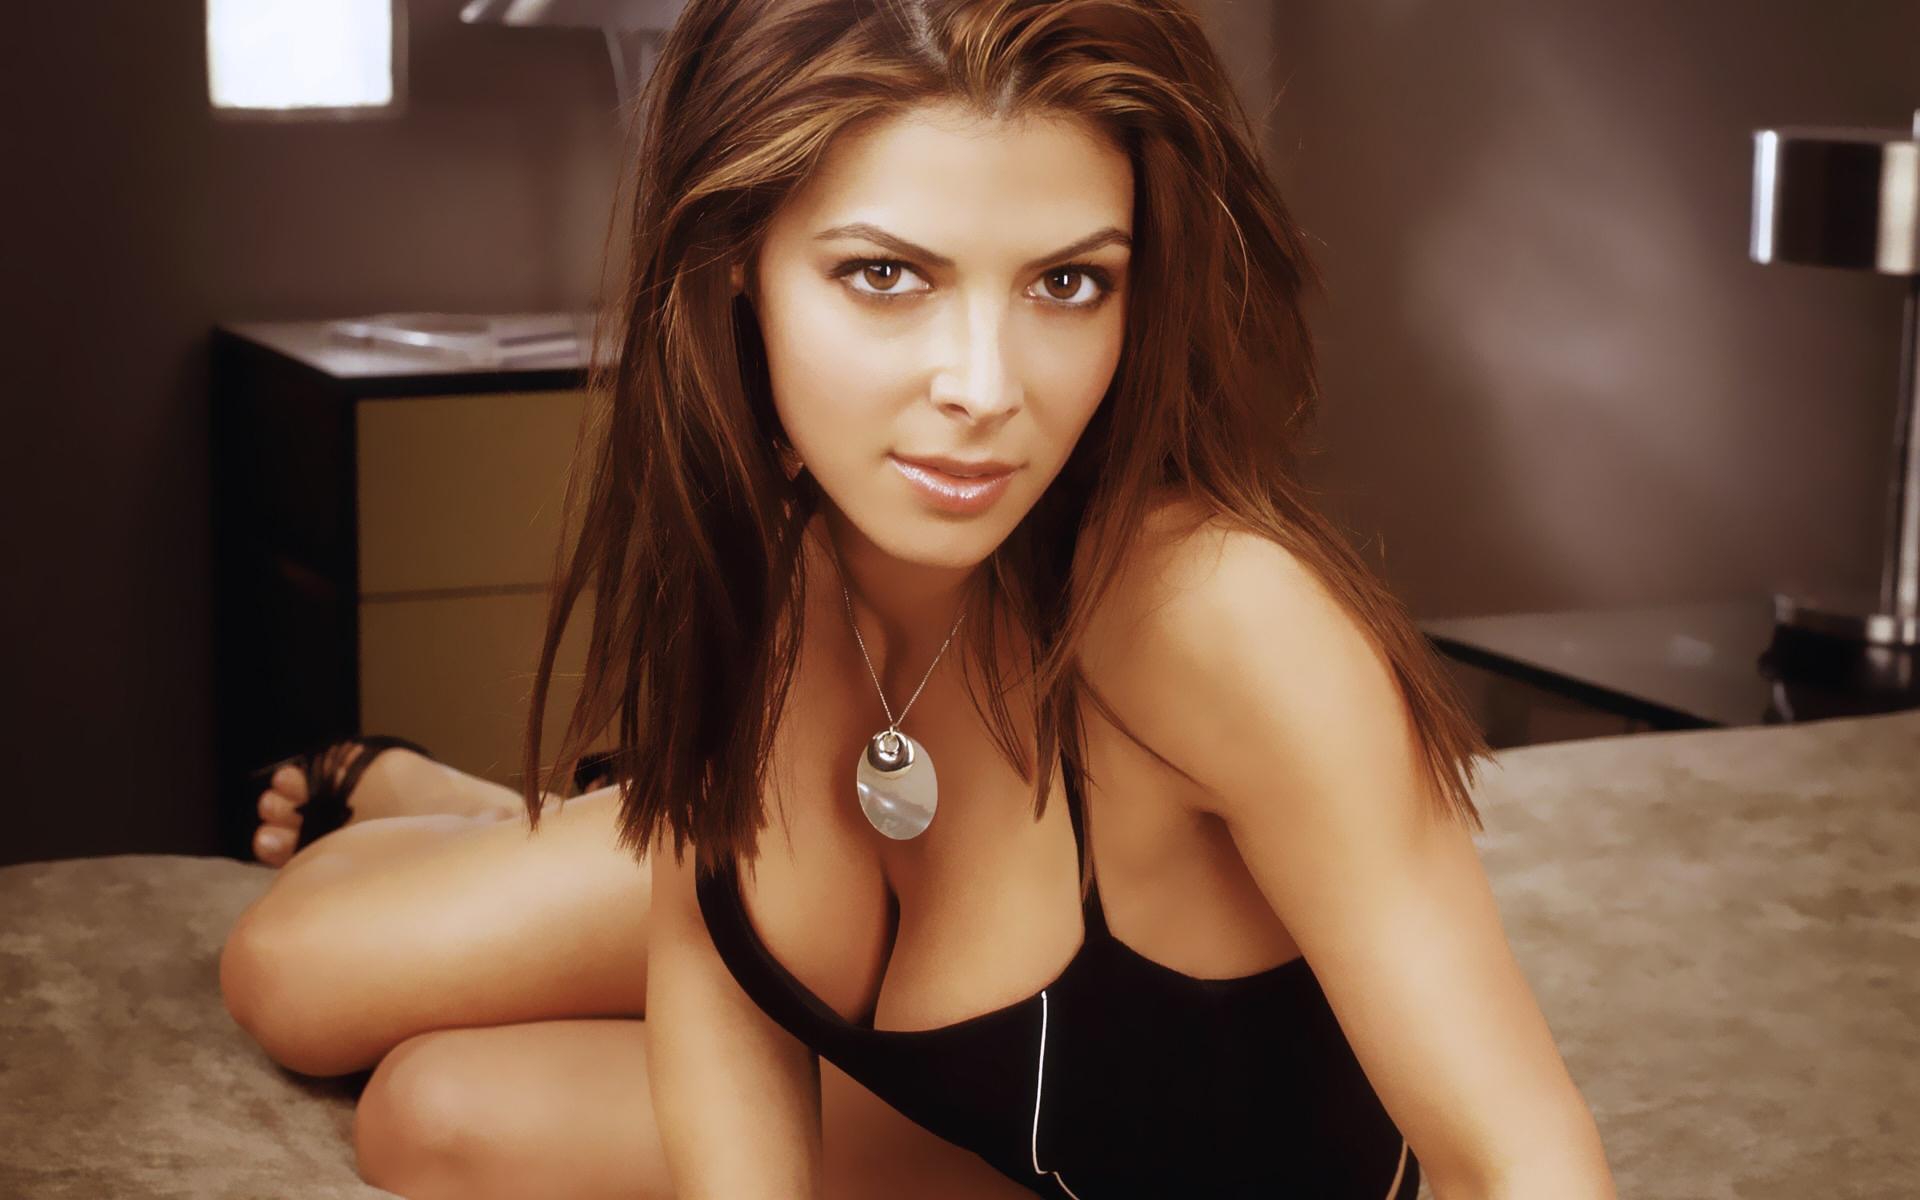 Обнаженная порно актриса Peta Jensen смотреть онлайн 1 фото